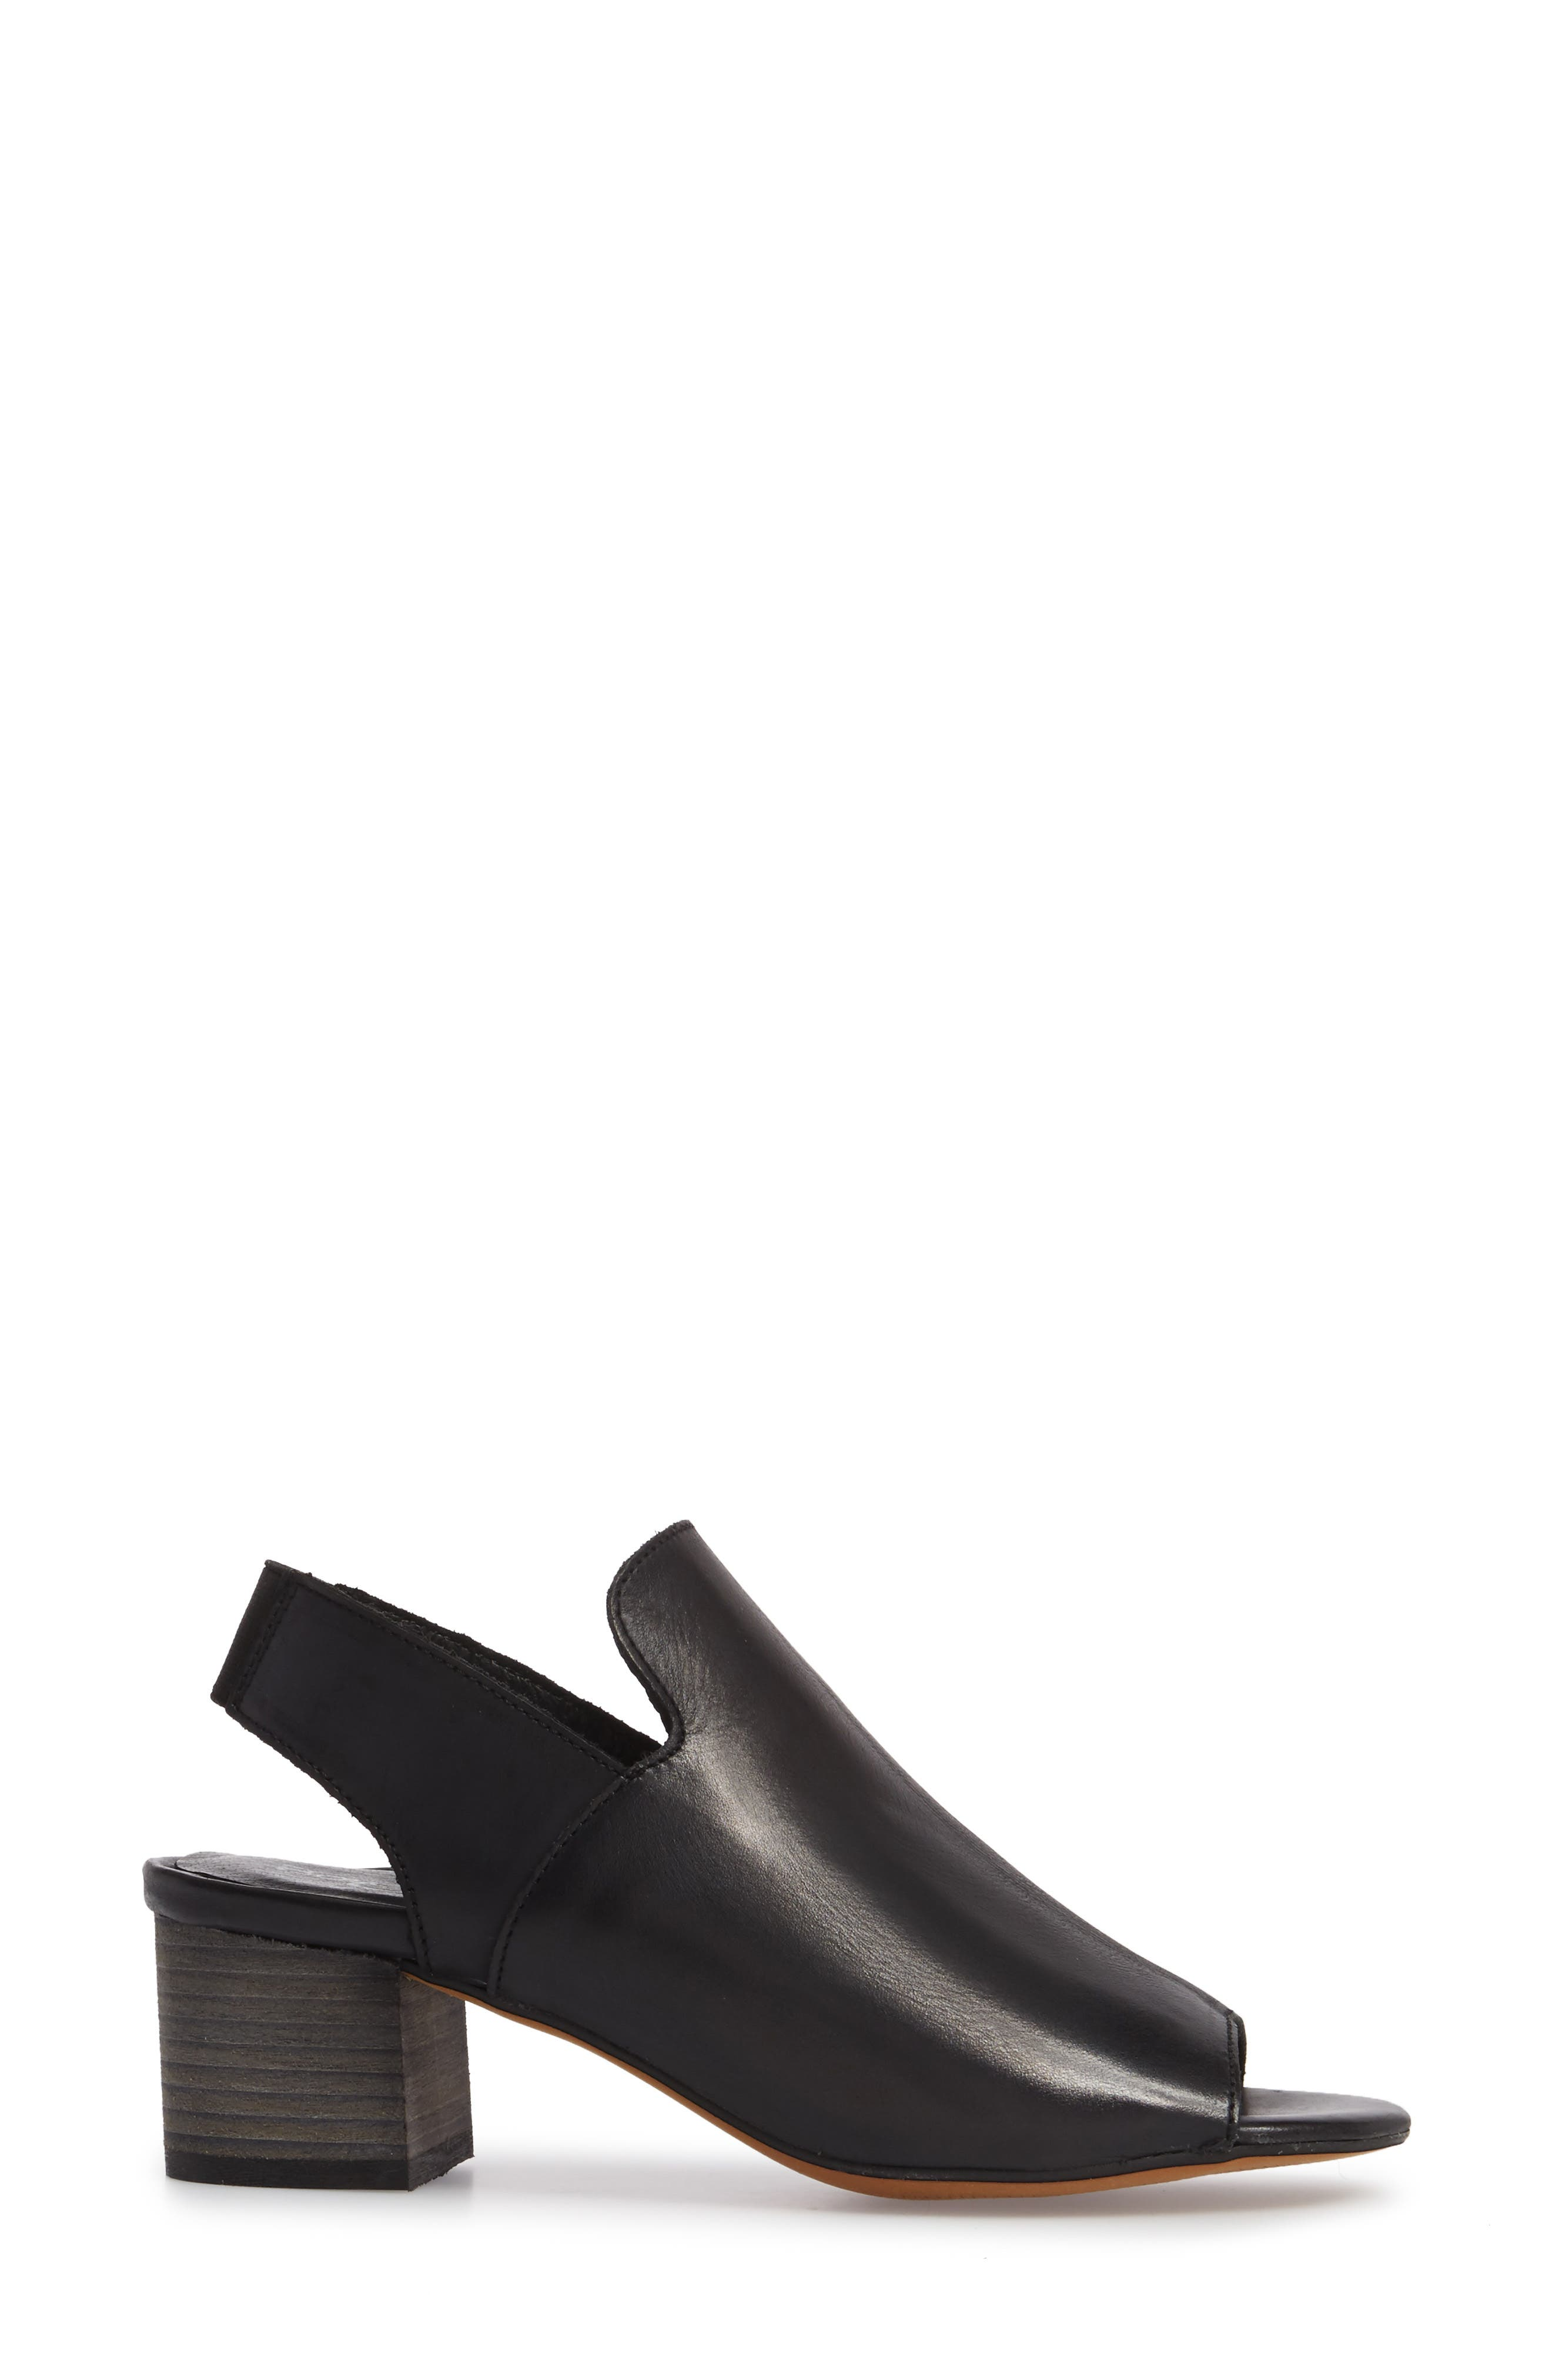 BOS. & CO., Zaire Slingback Sandal, Alternate thumbnail 3, color, BLACK GLAMOUR LEATHER